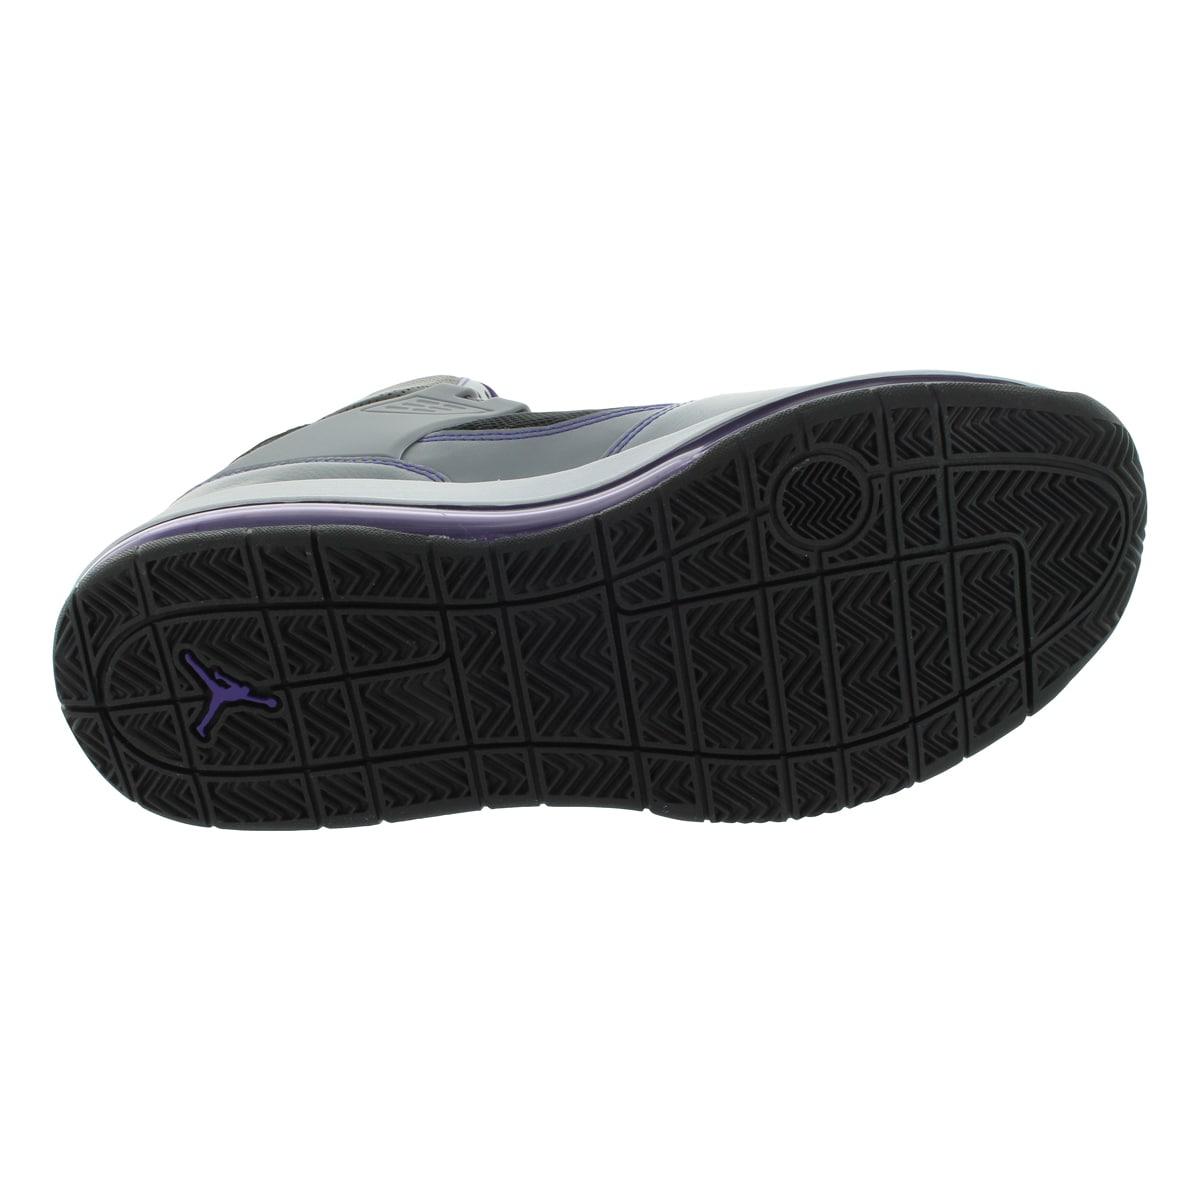 buy online c0d53 1a93a Shop Nike Jordan Flight 45 High Max Basketball Shoe - Free Shipping Today -  Overstock - 12318809